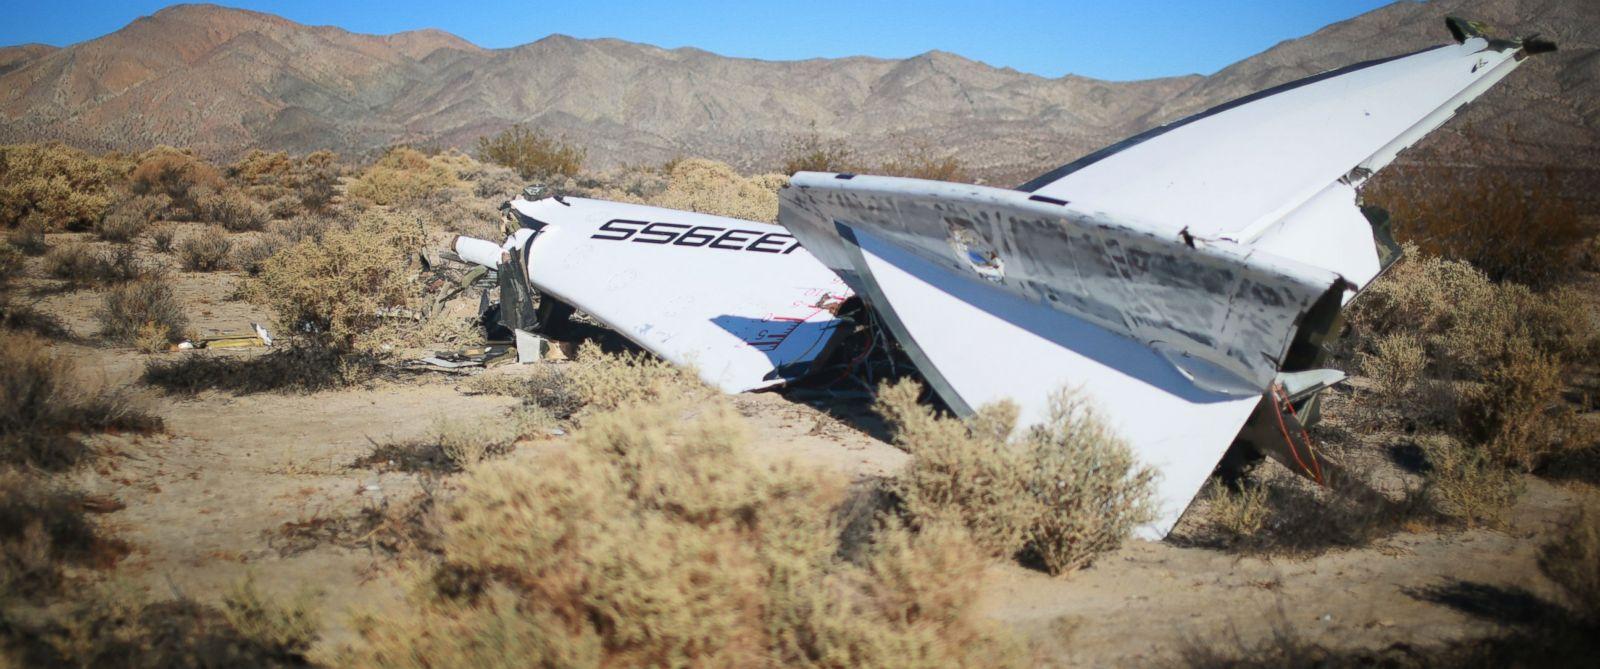 spacecraft crash - photo #26